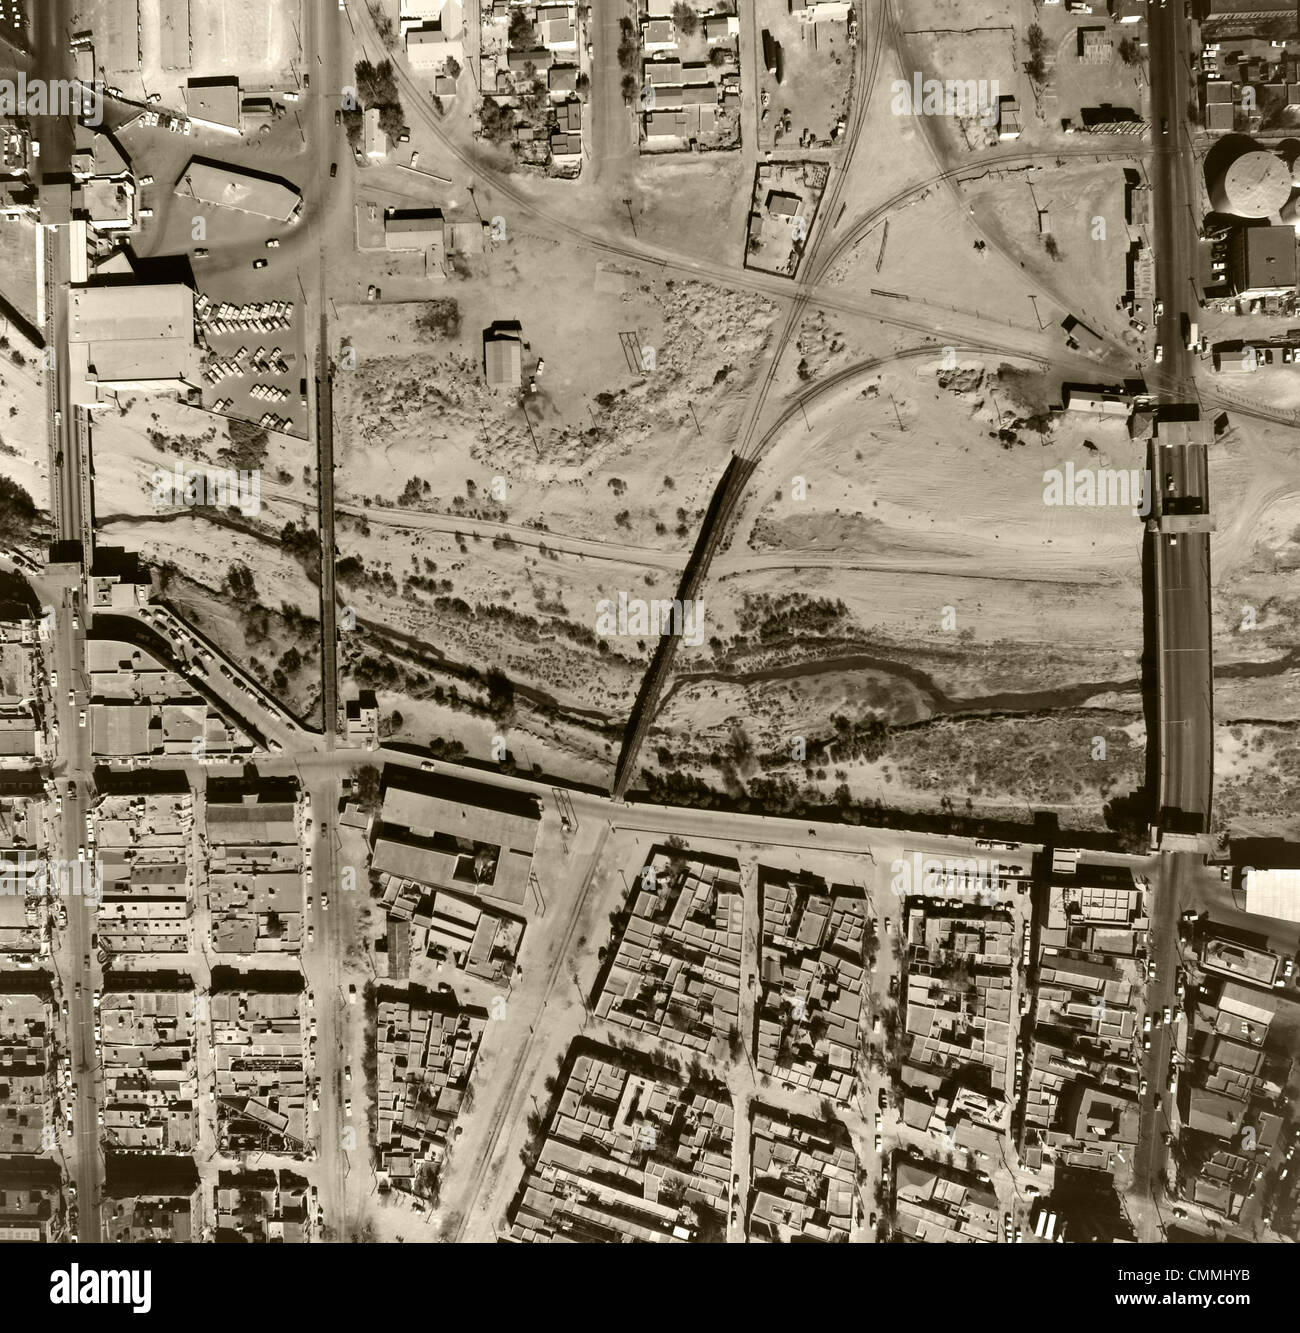 historical aerial photograph Mexican American border El Paso Texas